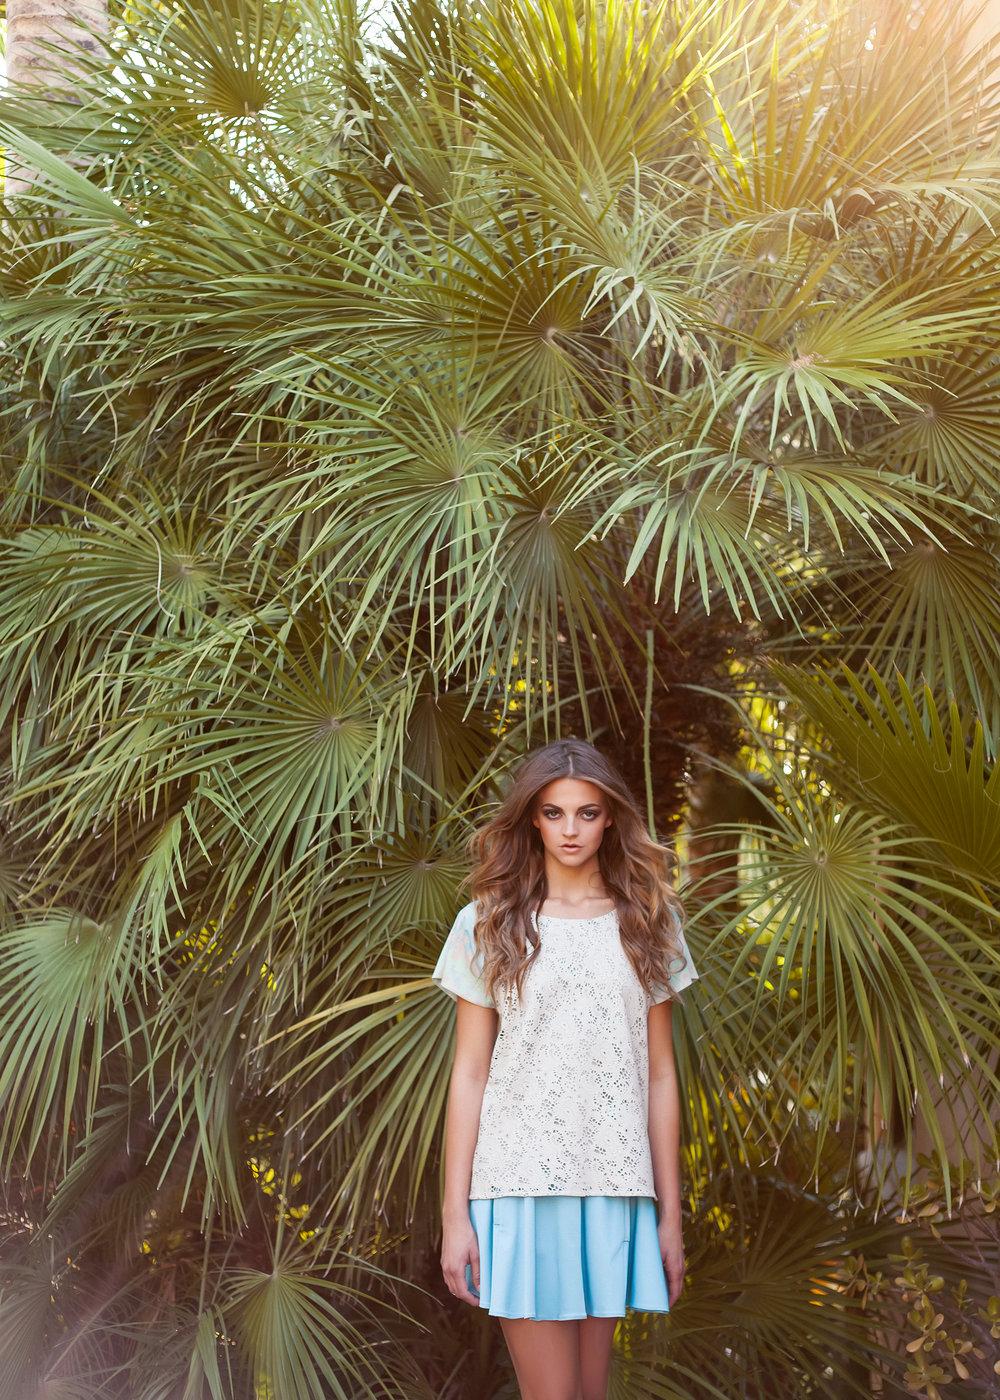 JessicaFaulkner-SS14_006.jpg